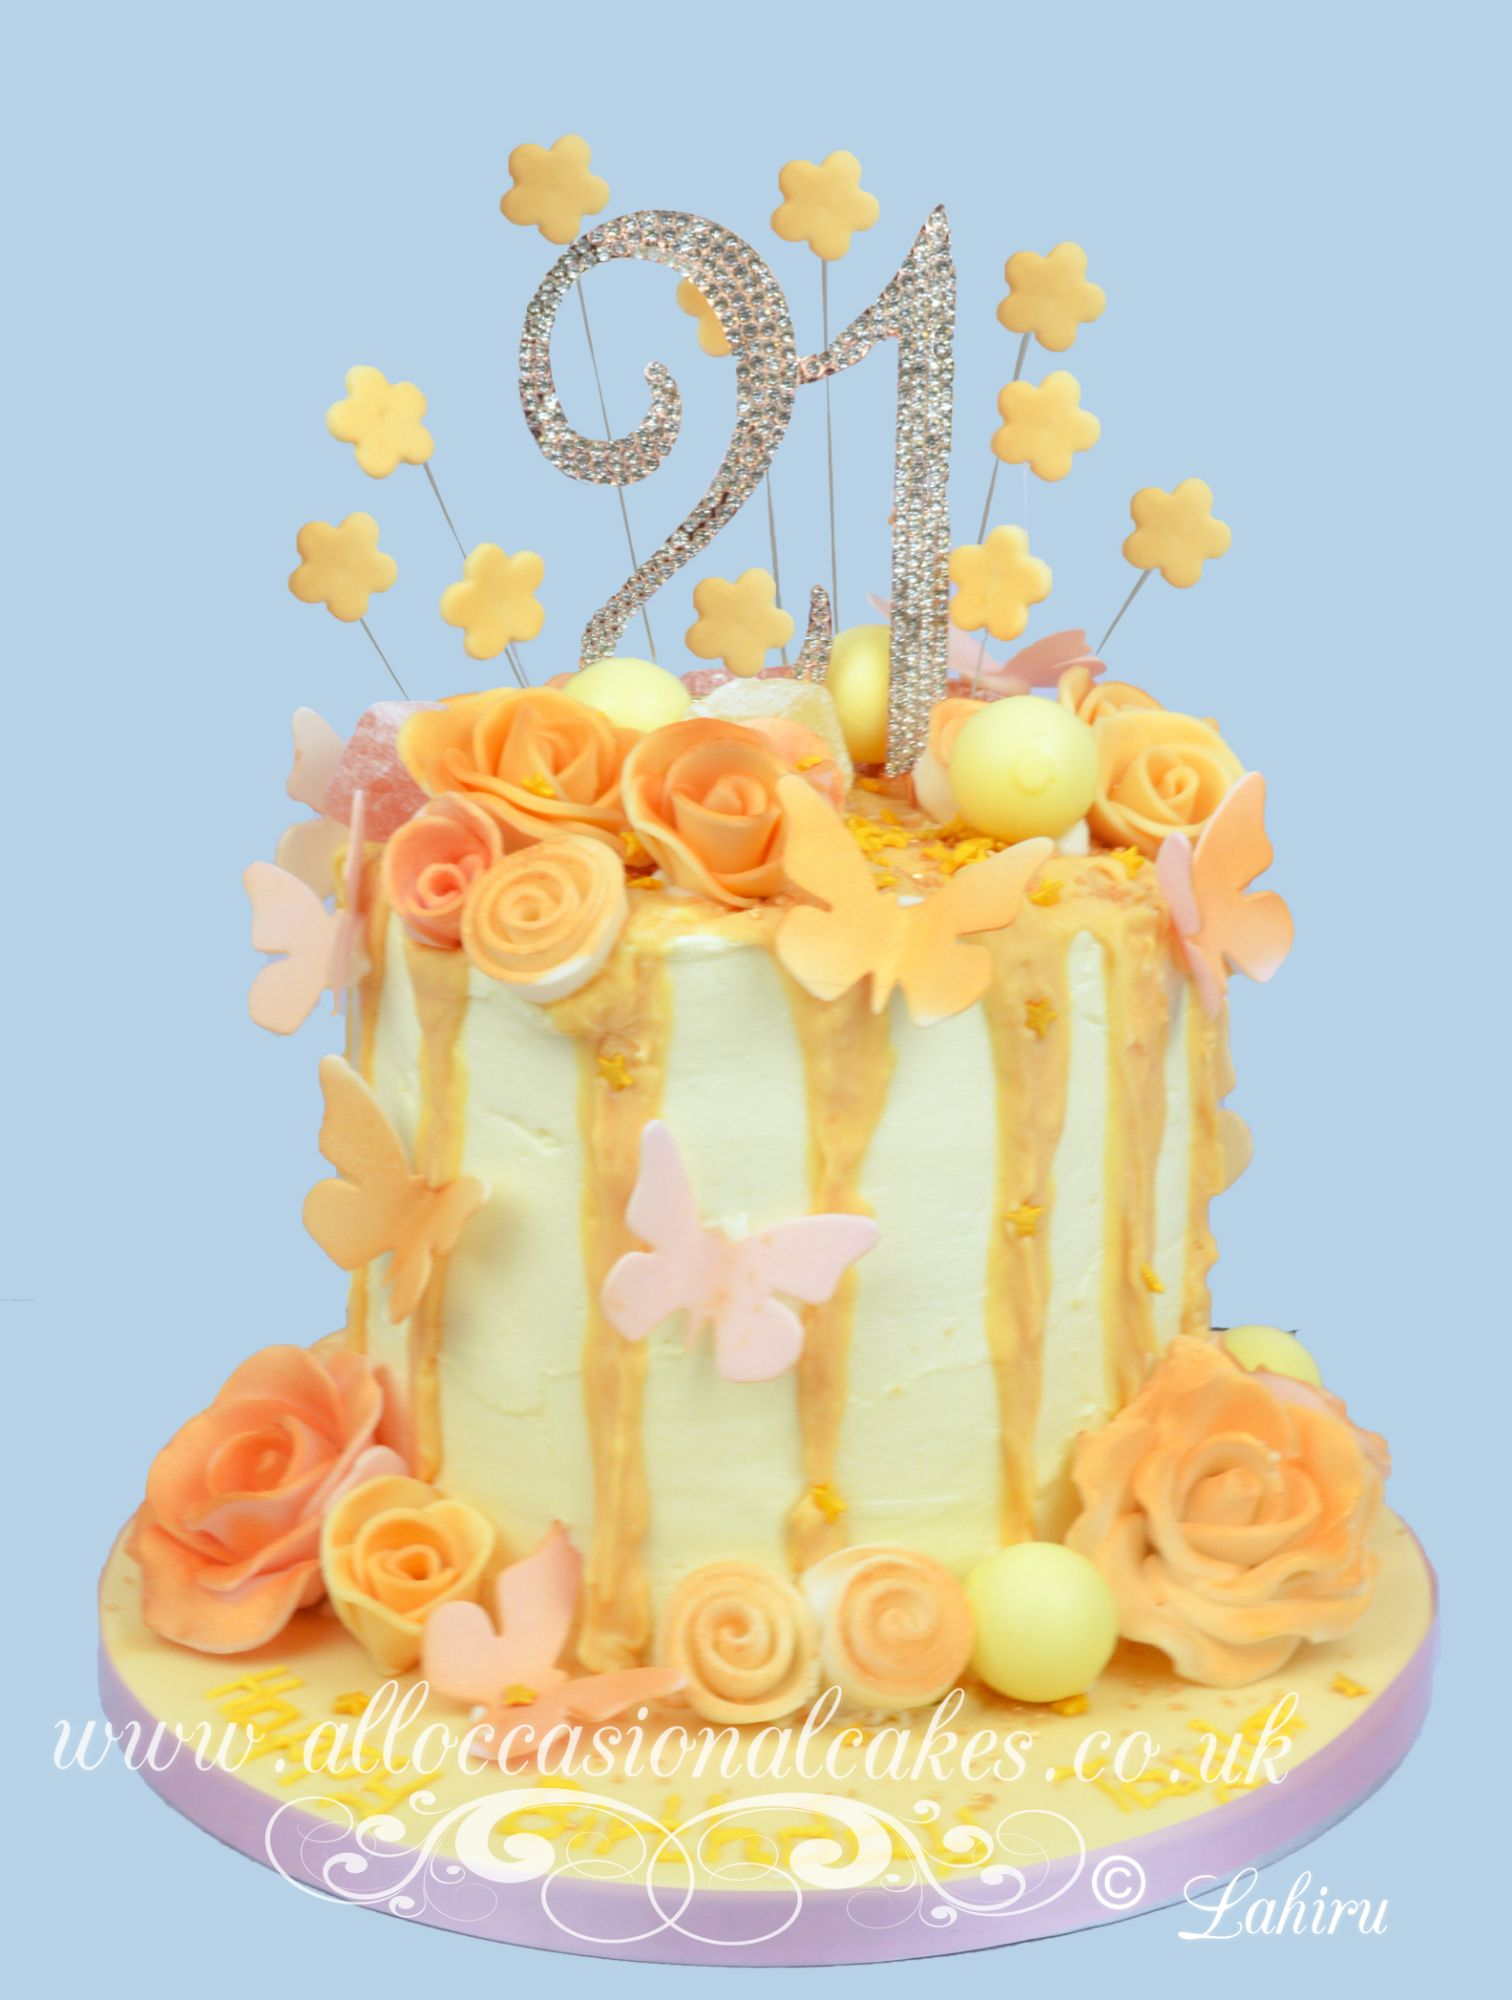 rose gold dripping cake